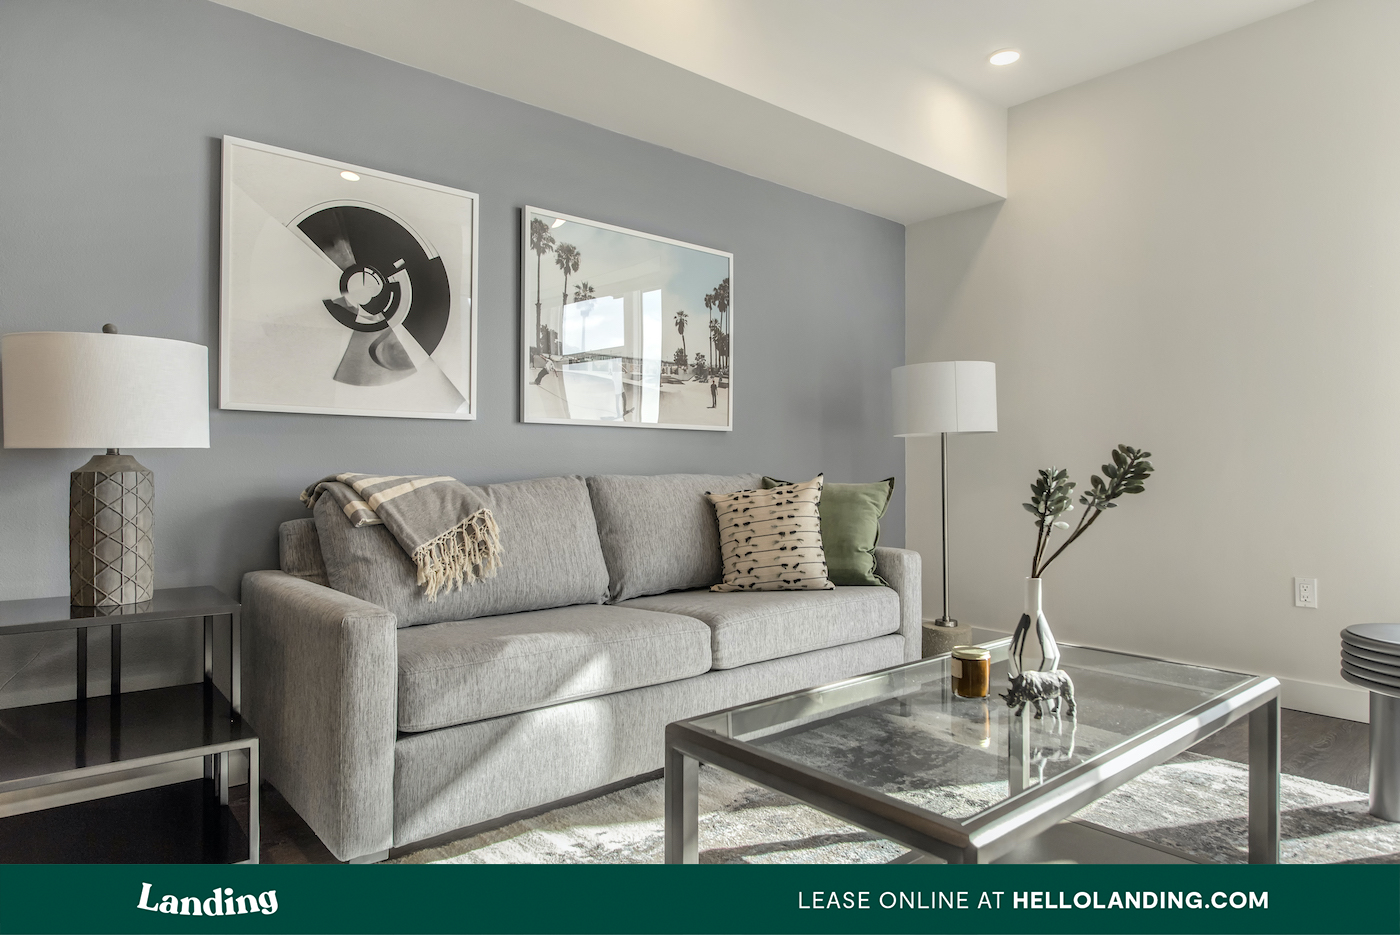 Fusion Orlando 926 for rent